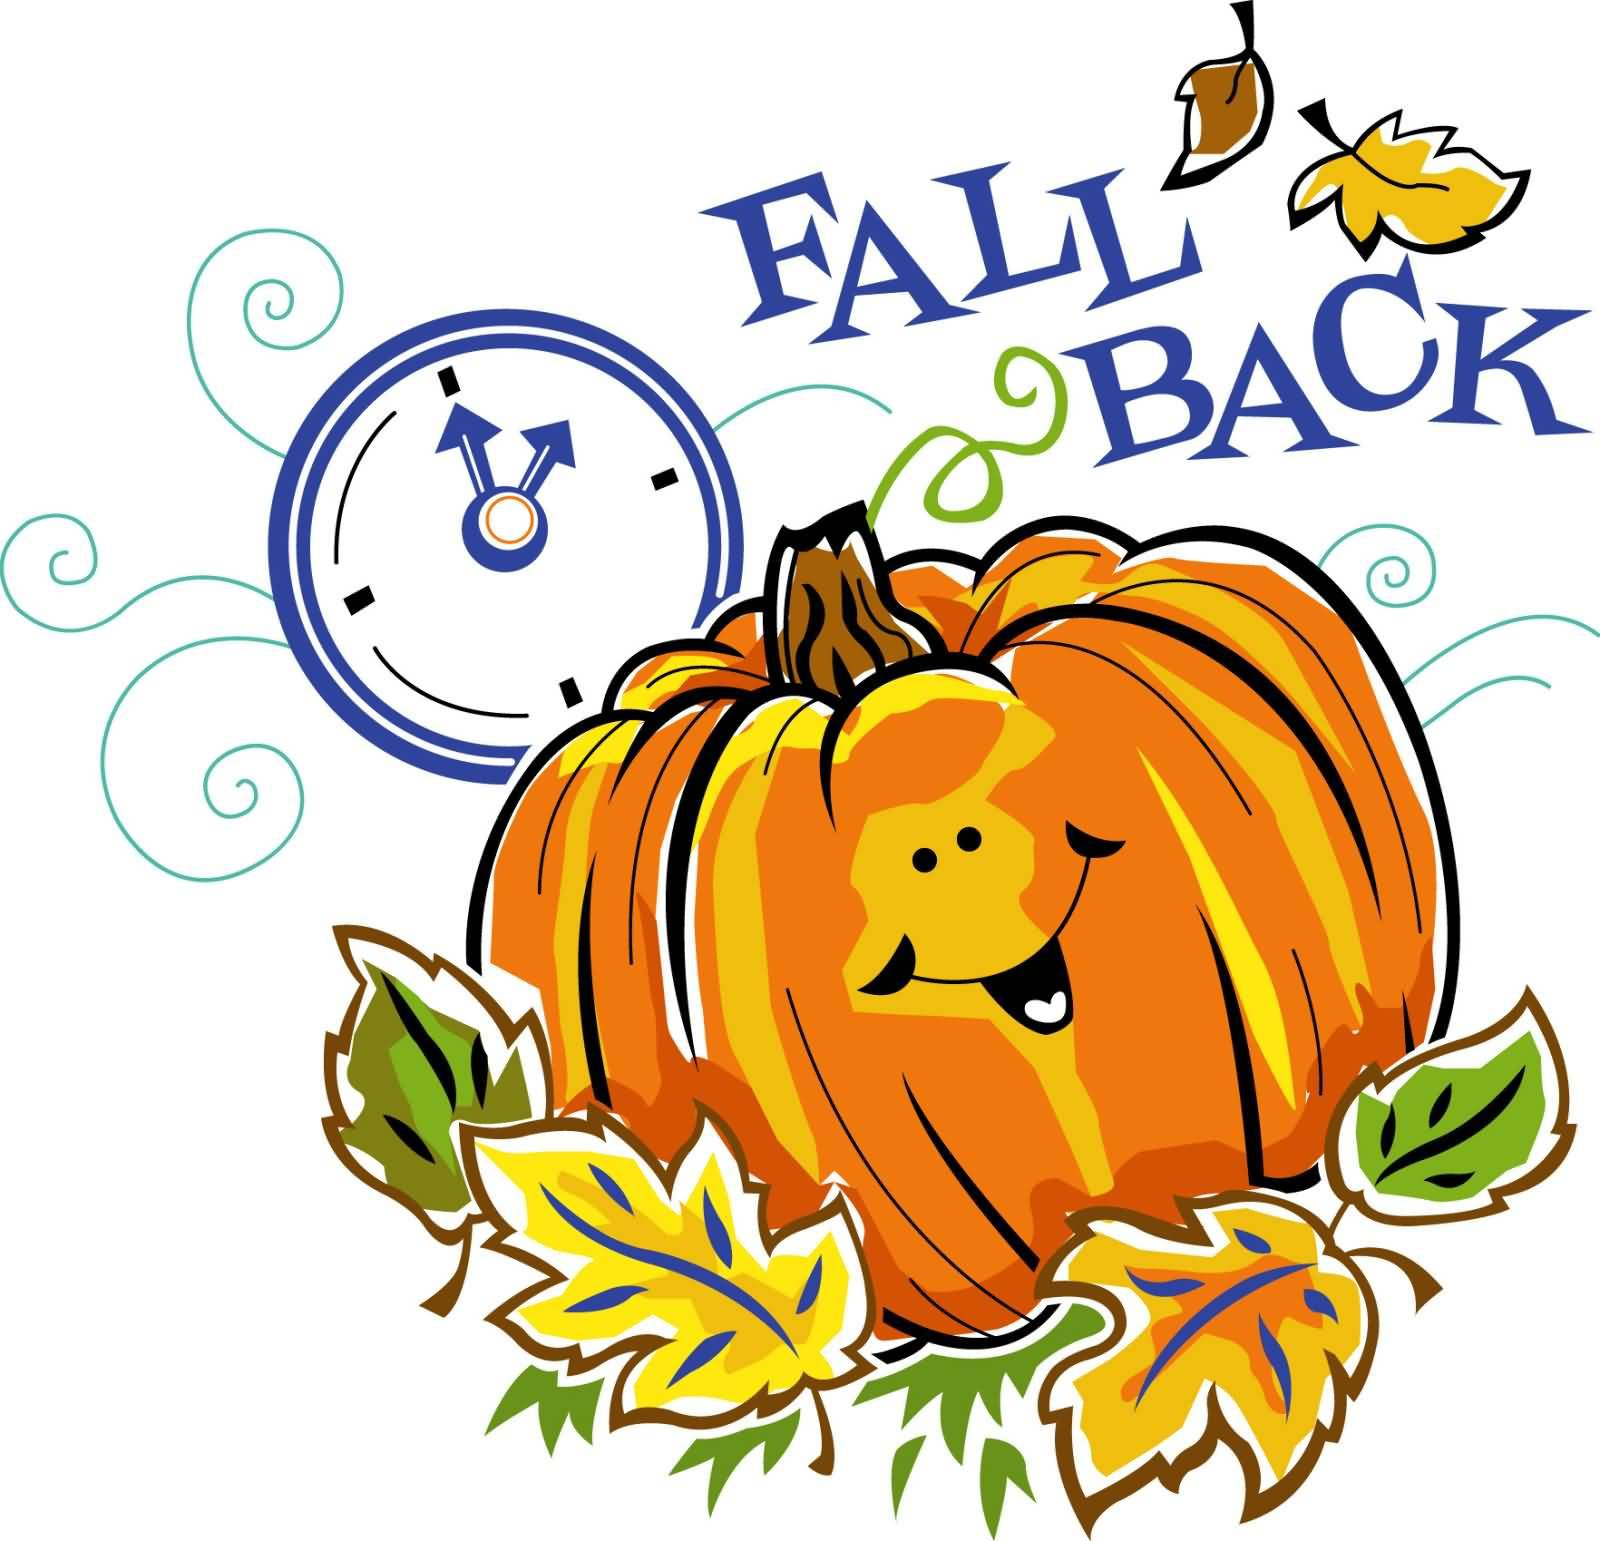 Fall back clipart daylight saving time 2 » Clipart Portal.